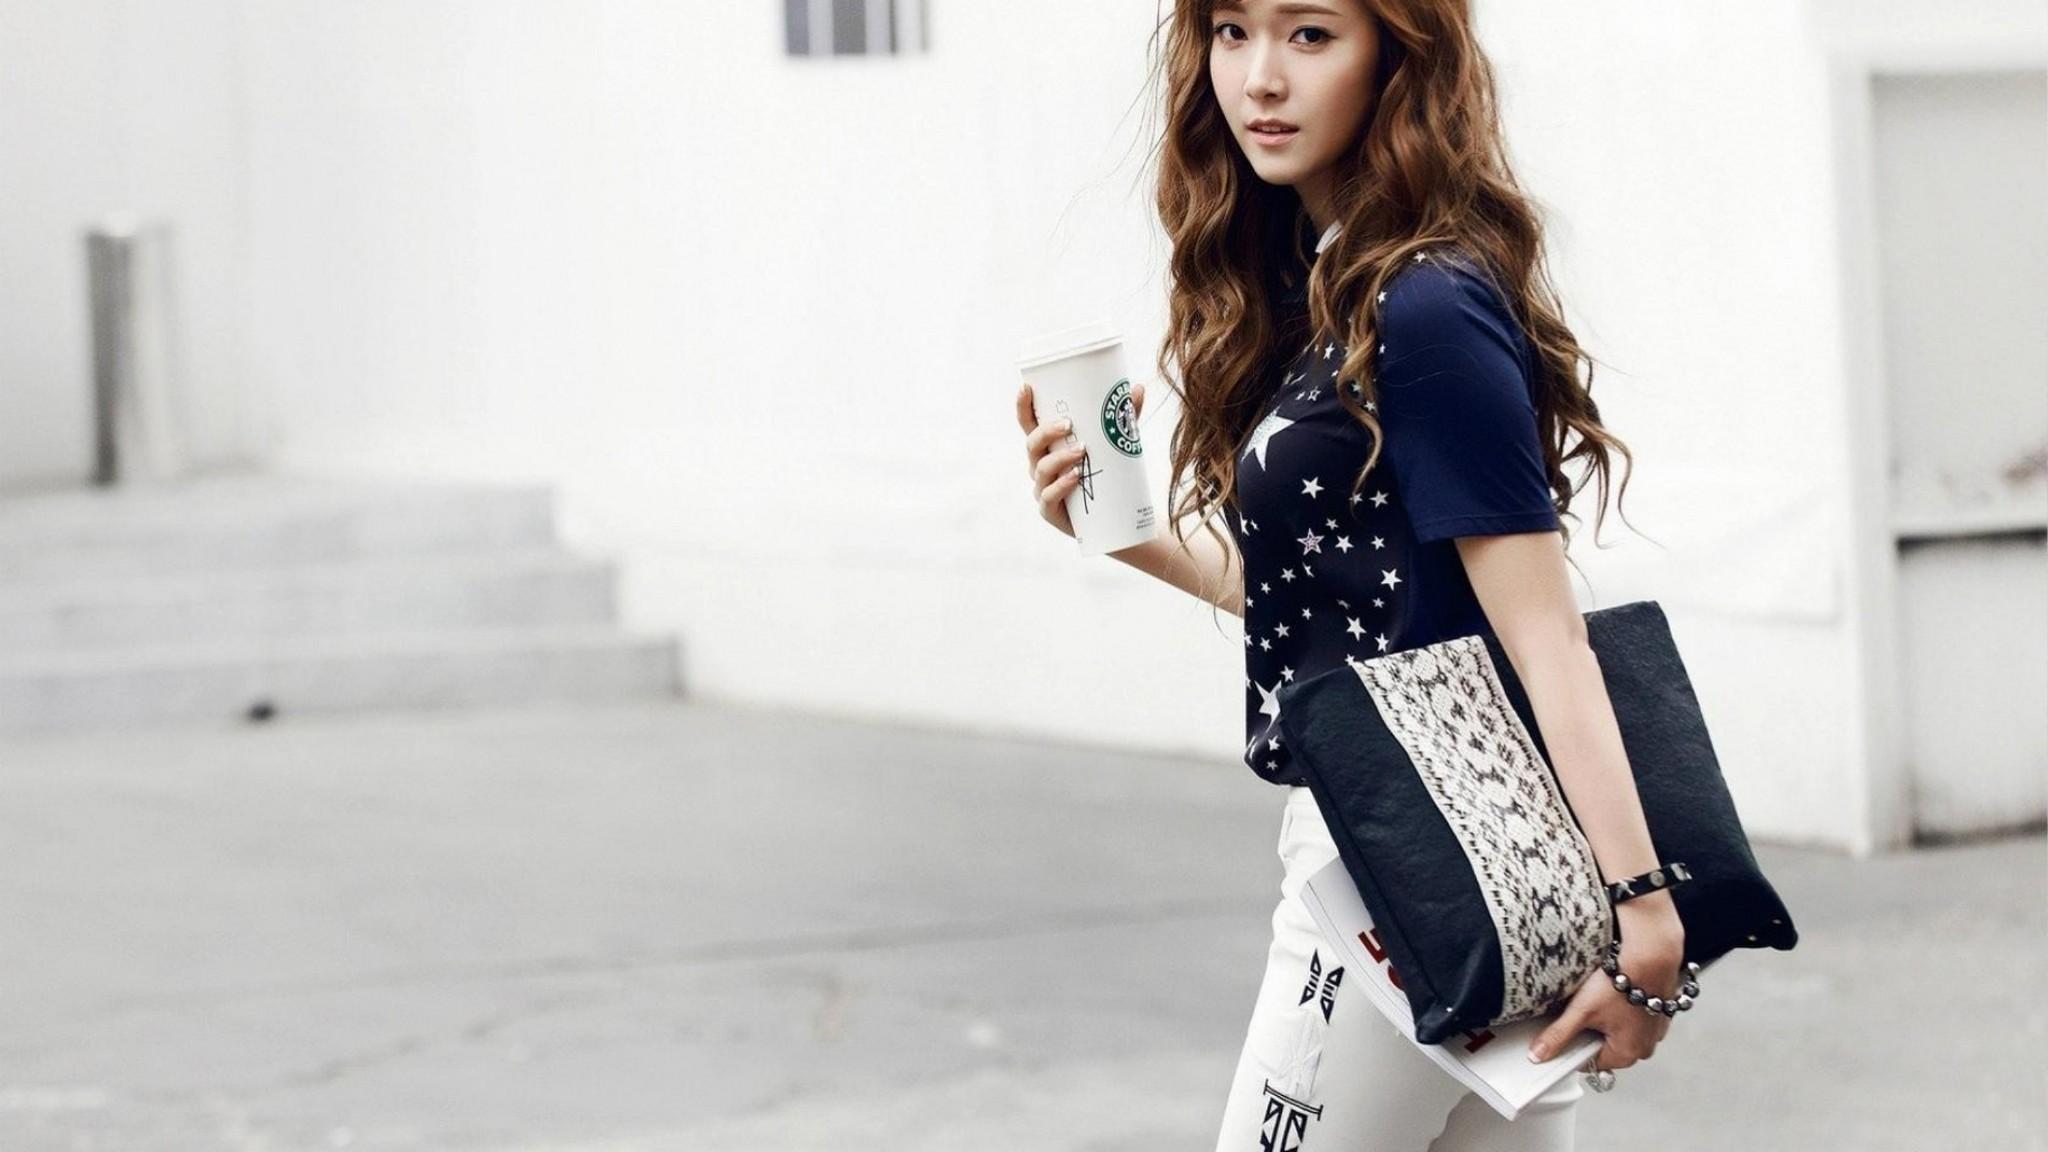 Snsd  girls generation  k pop  south korea  music  girl  jessica HD Wallpaper